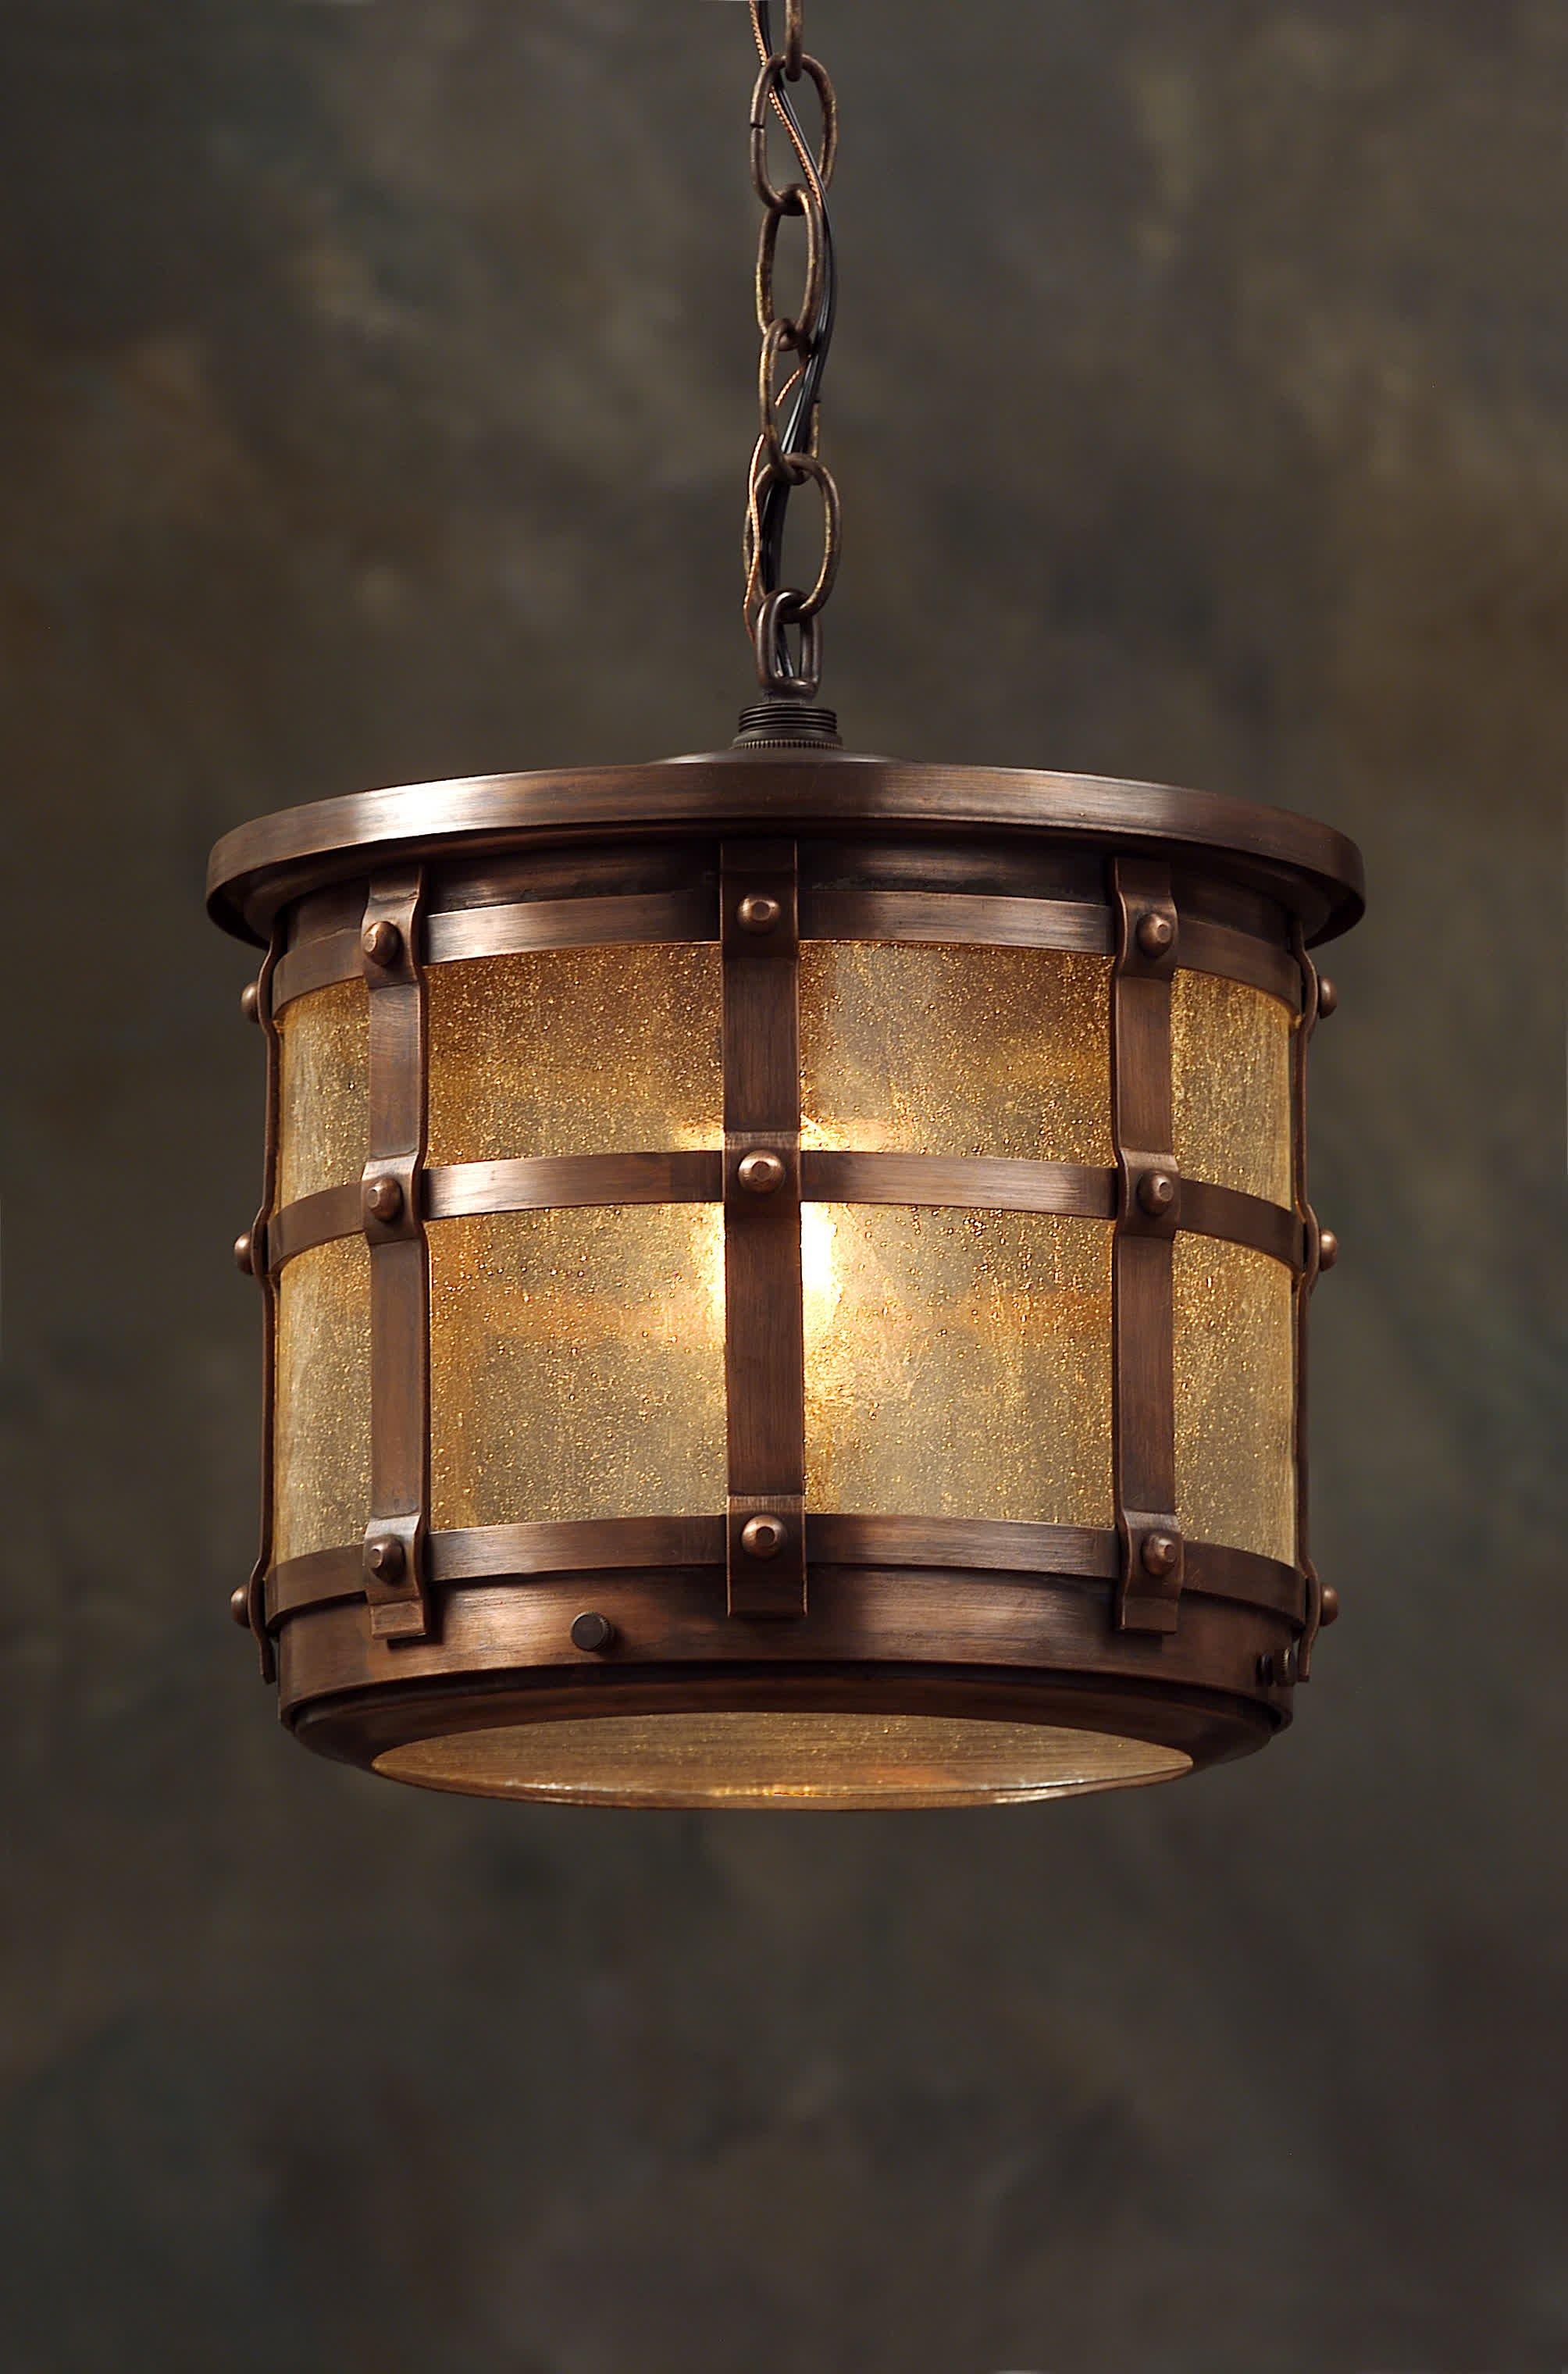 English Tudor Hanging Light Fixture Revival Lighting